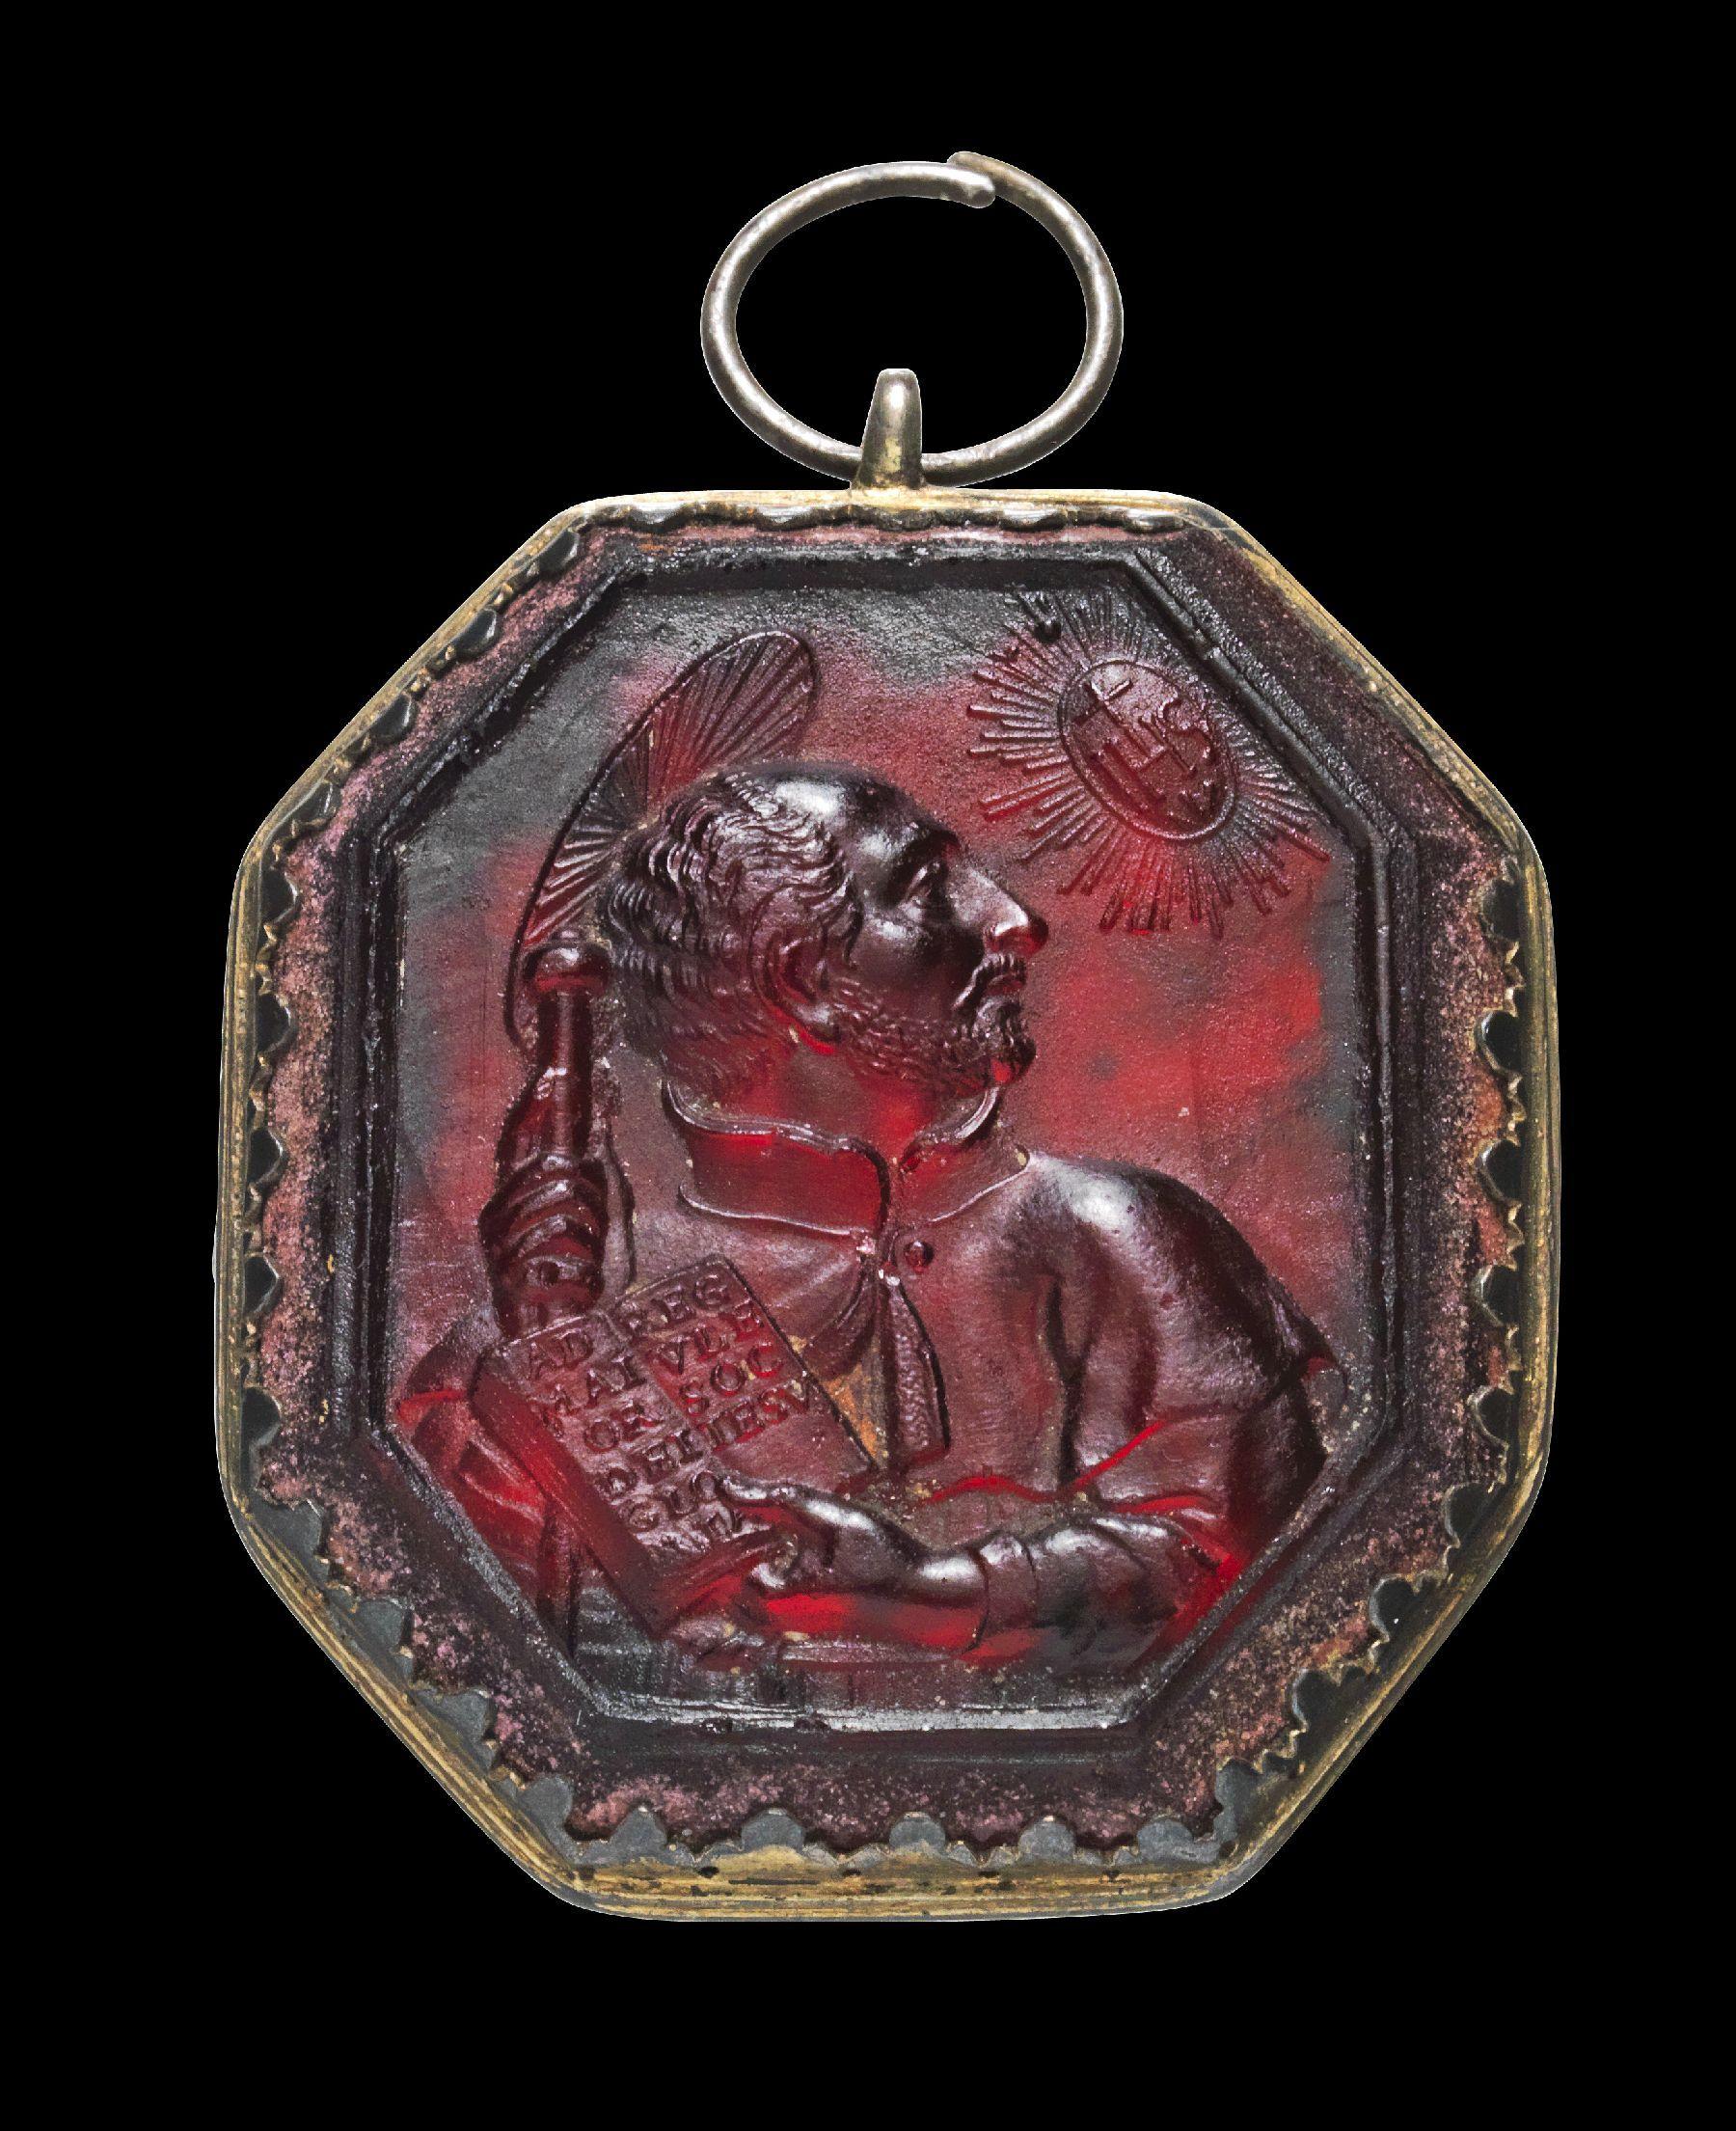 Gorny Mosch Munich Auction Detail Ancient Jewelry Intaglio Jewelry Vintage Cameo